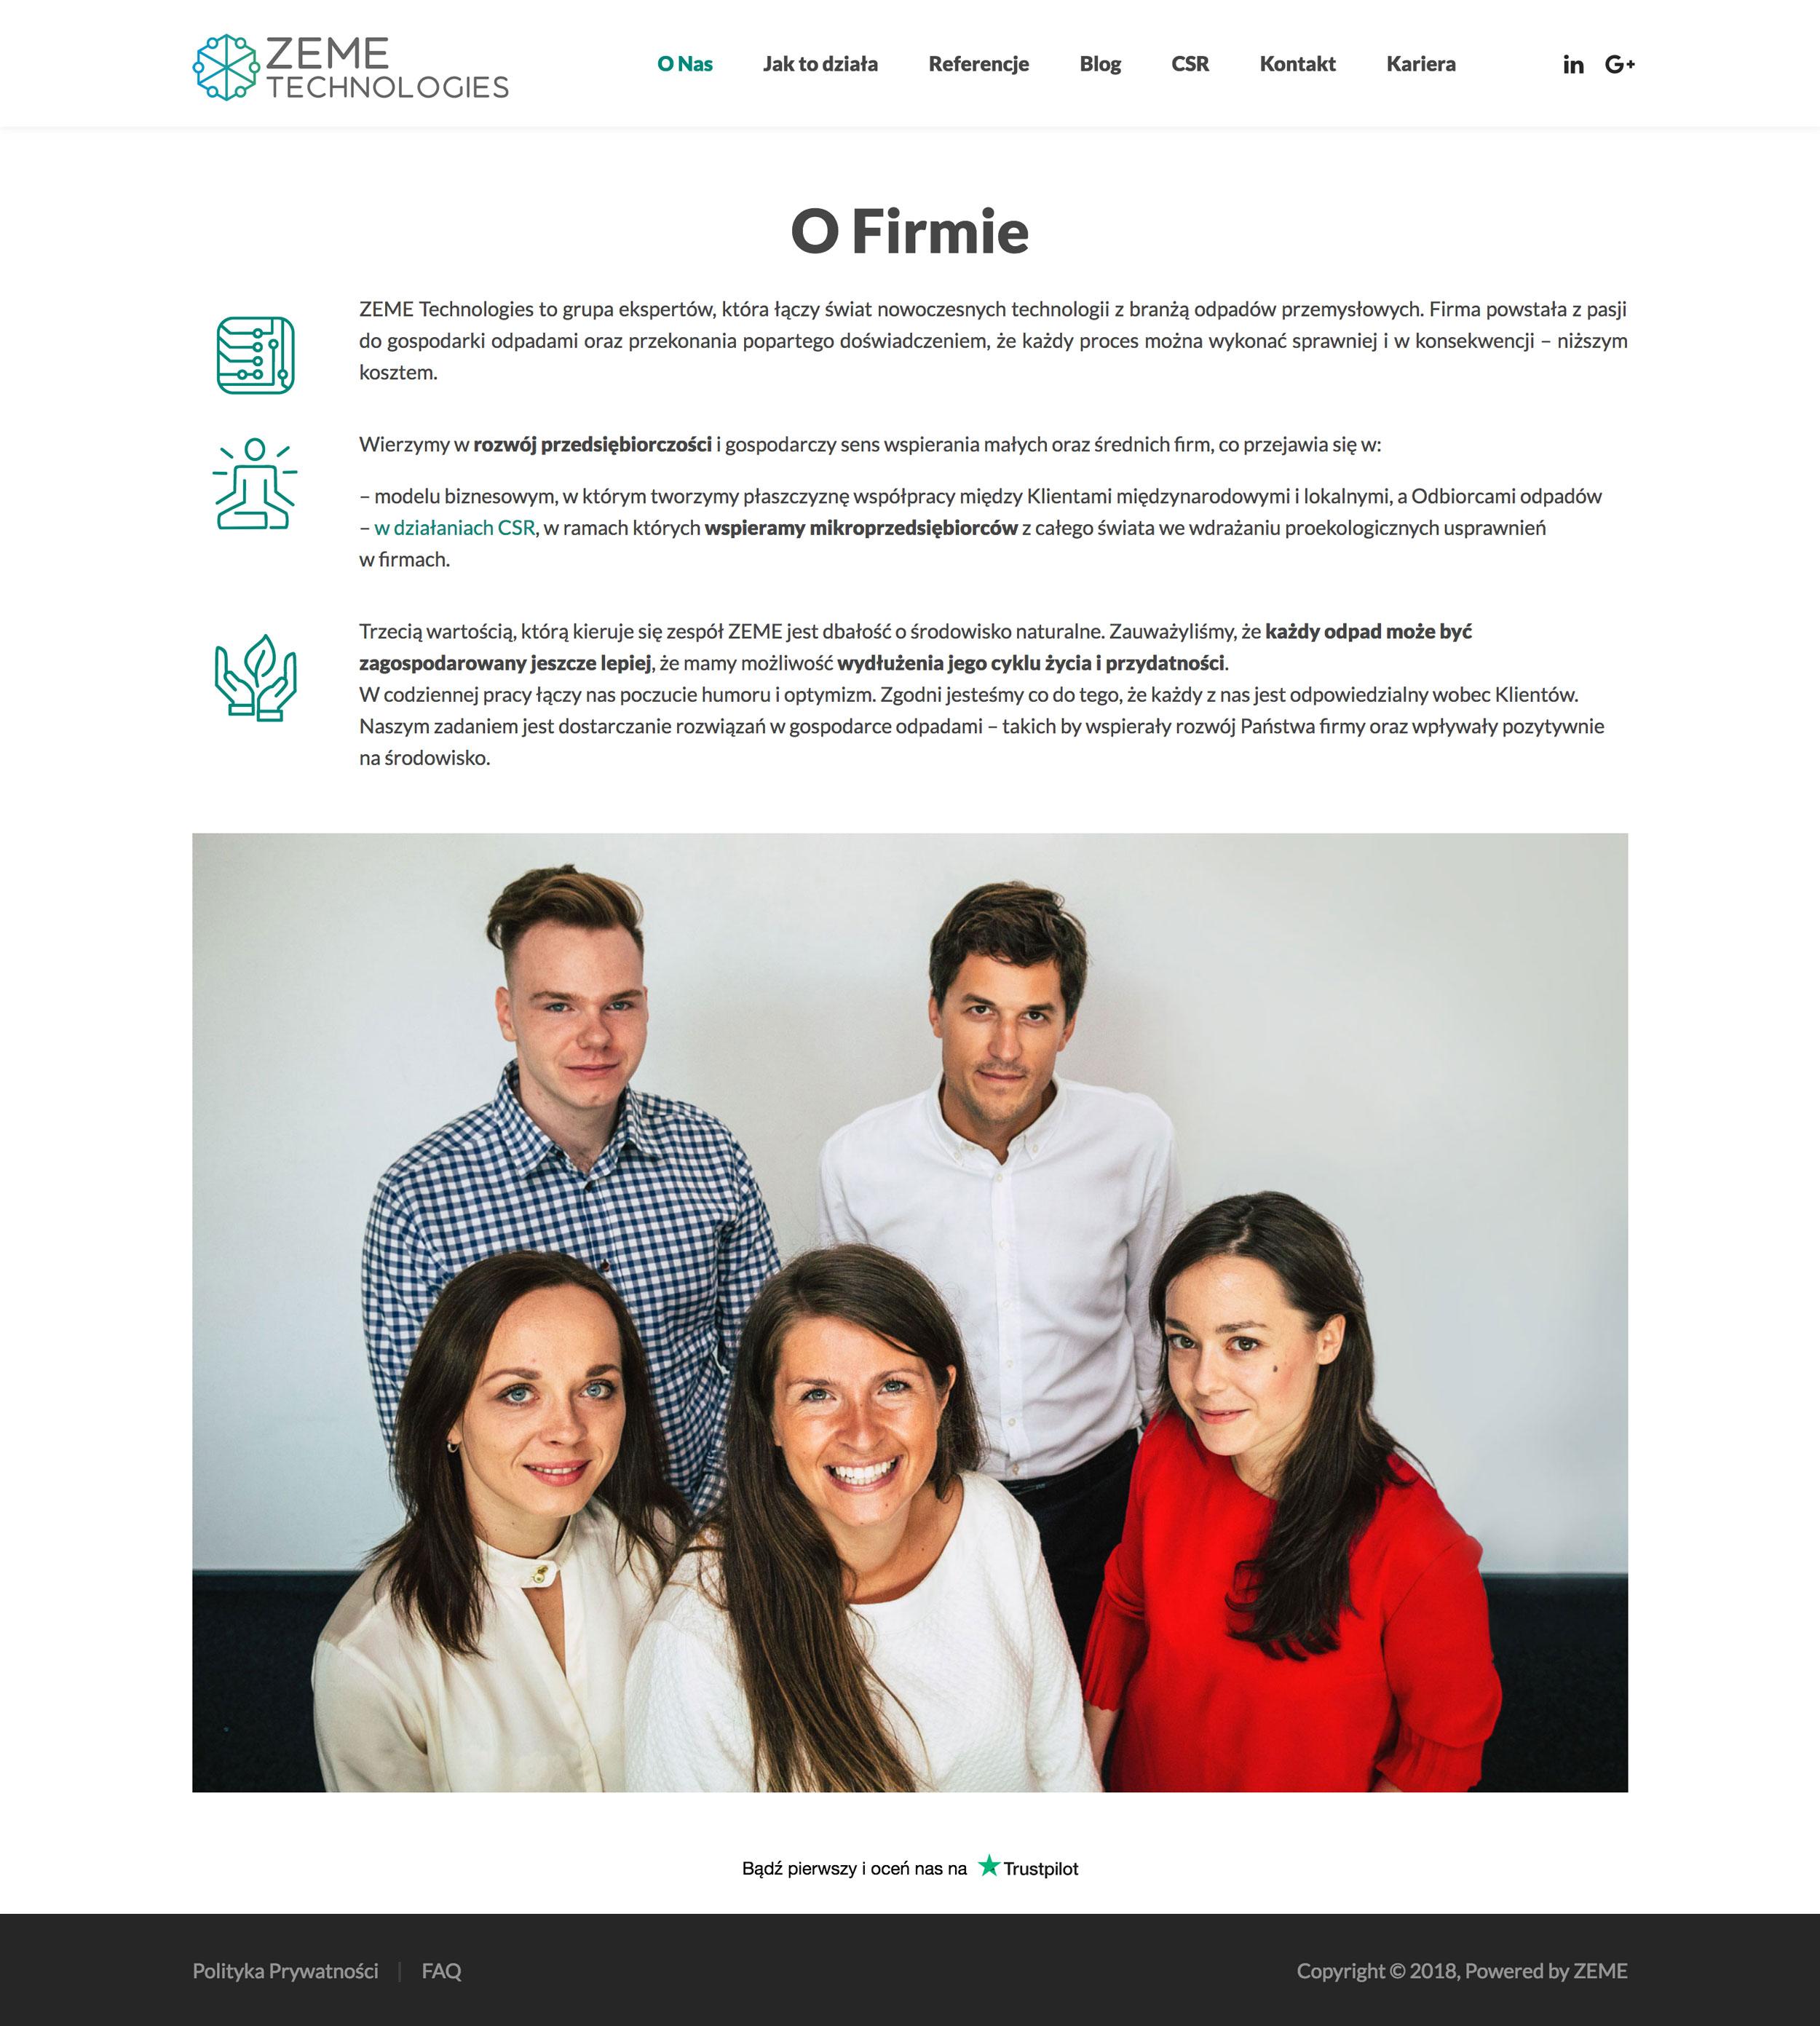 ZEME Technologies - O Firmie